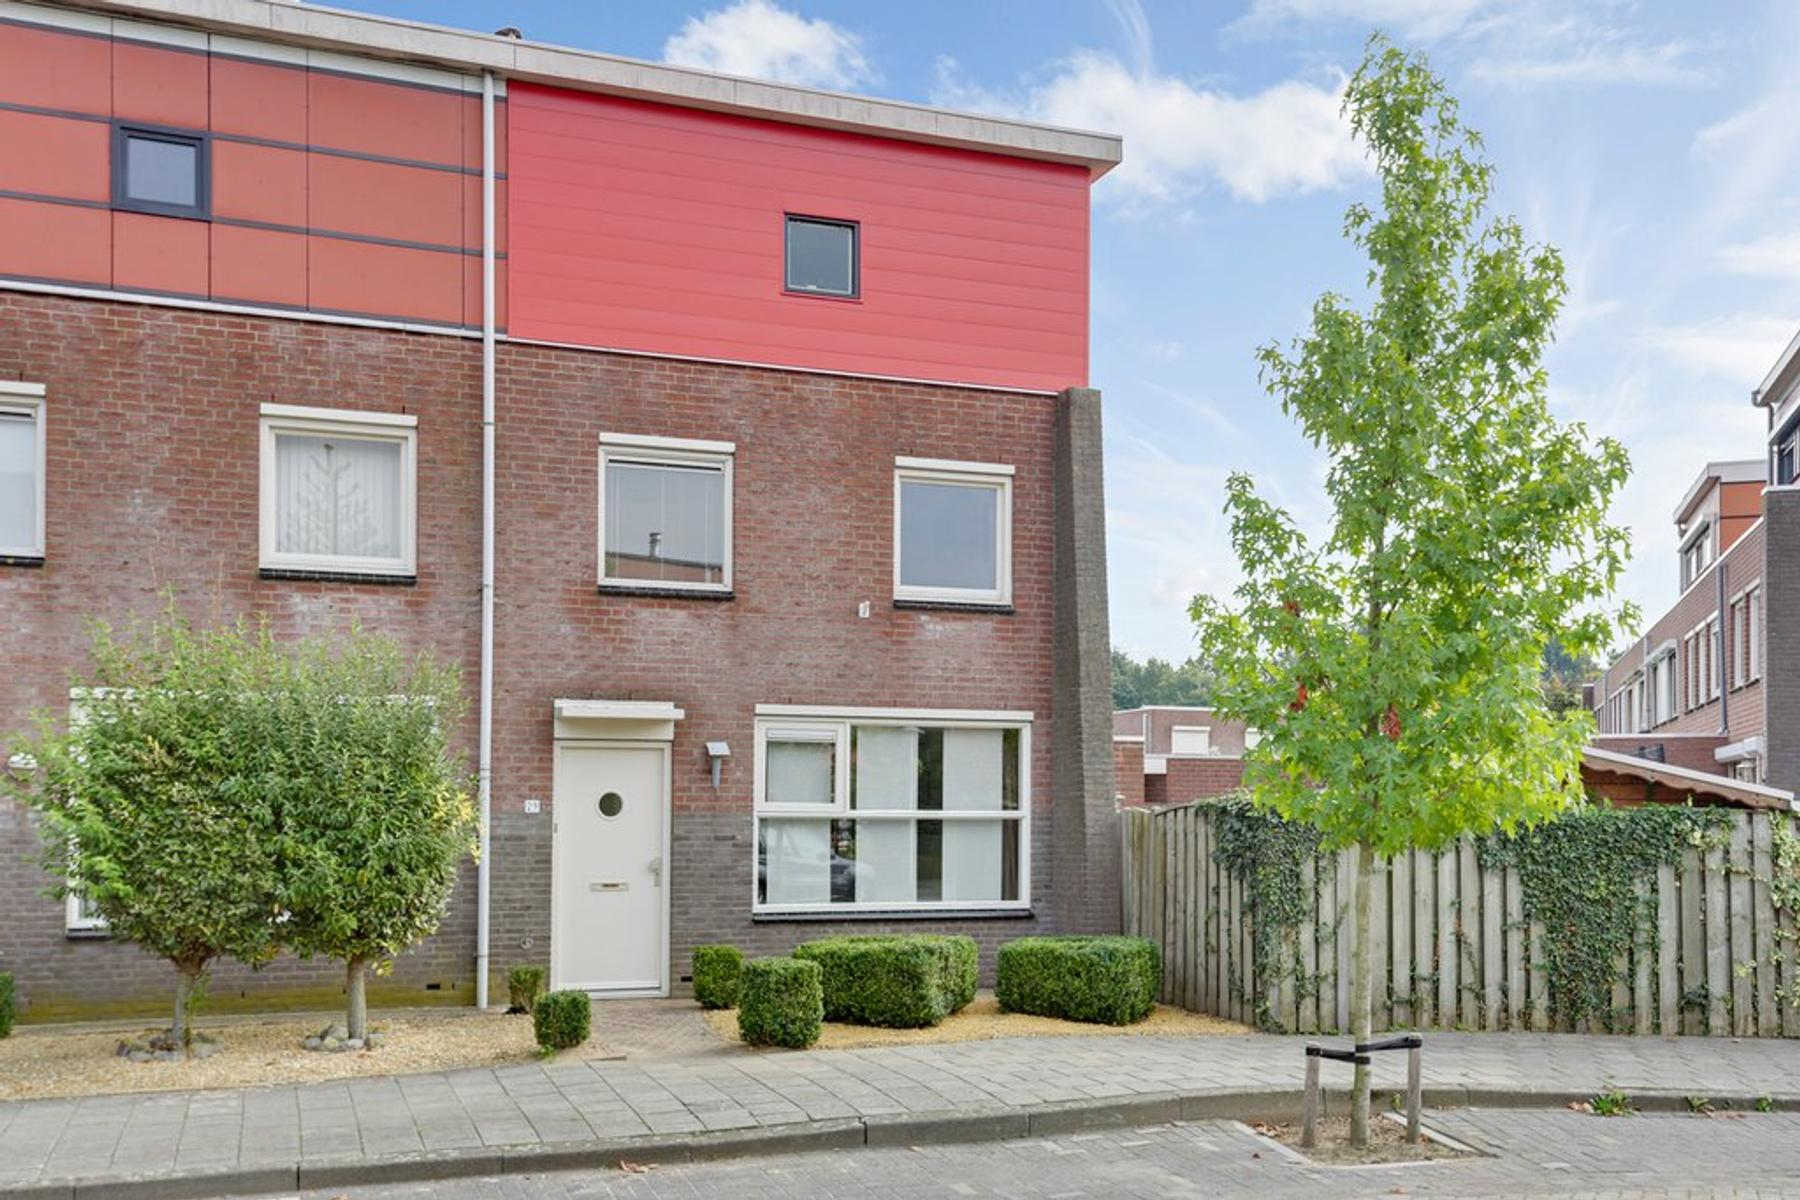 Koningskinderen 29 in Eindhoven 5629 KC